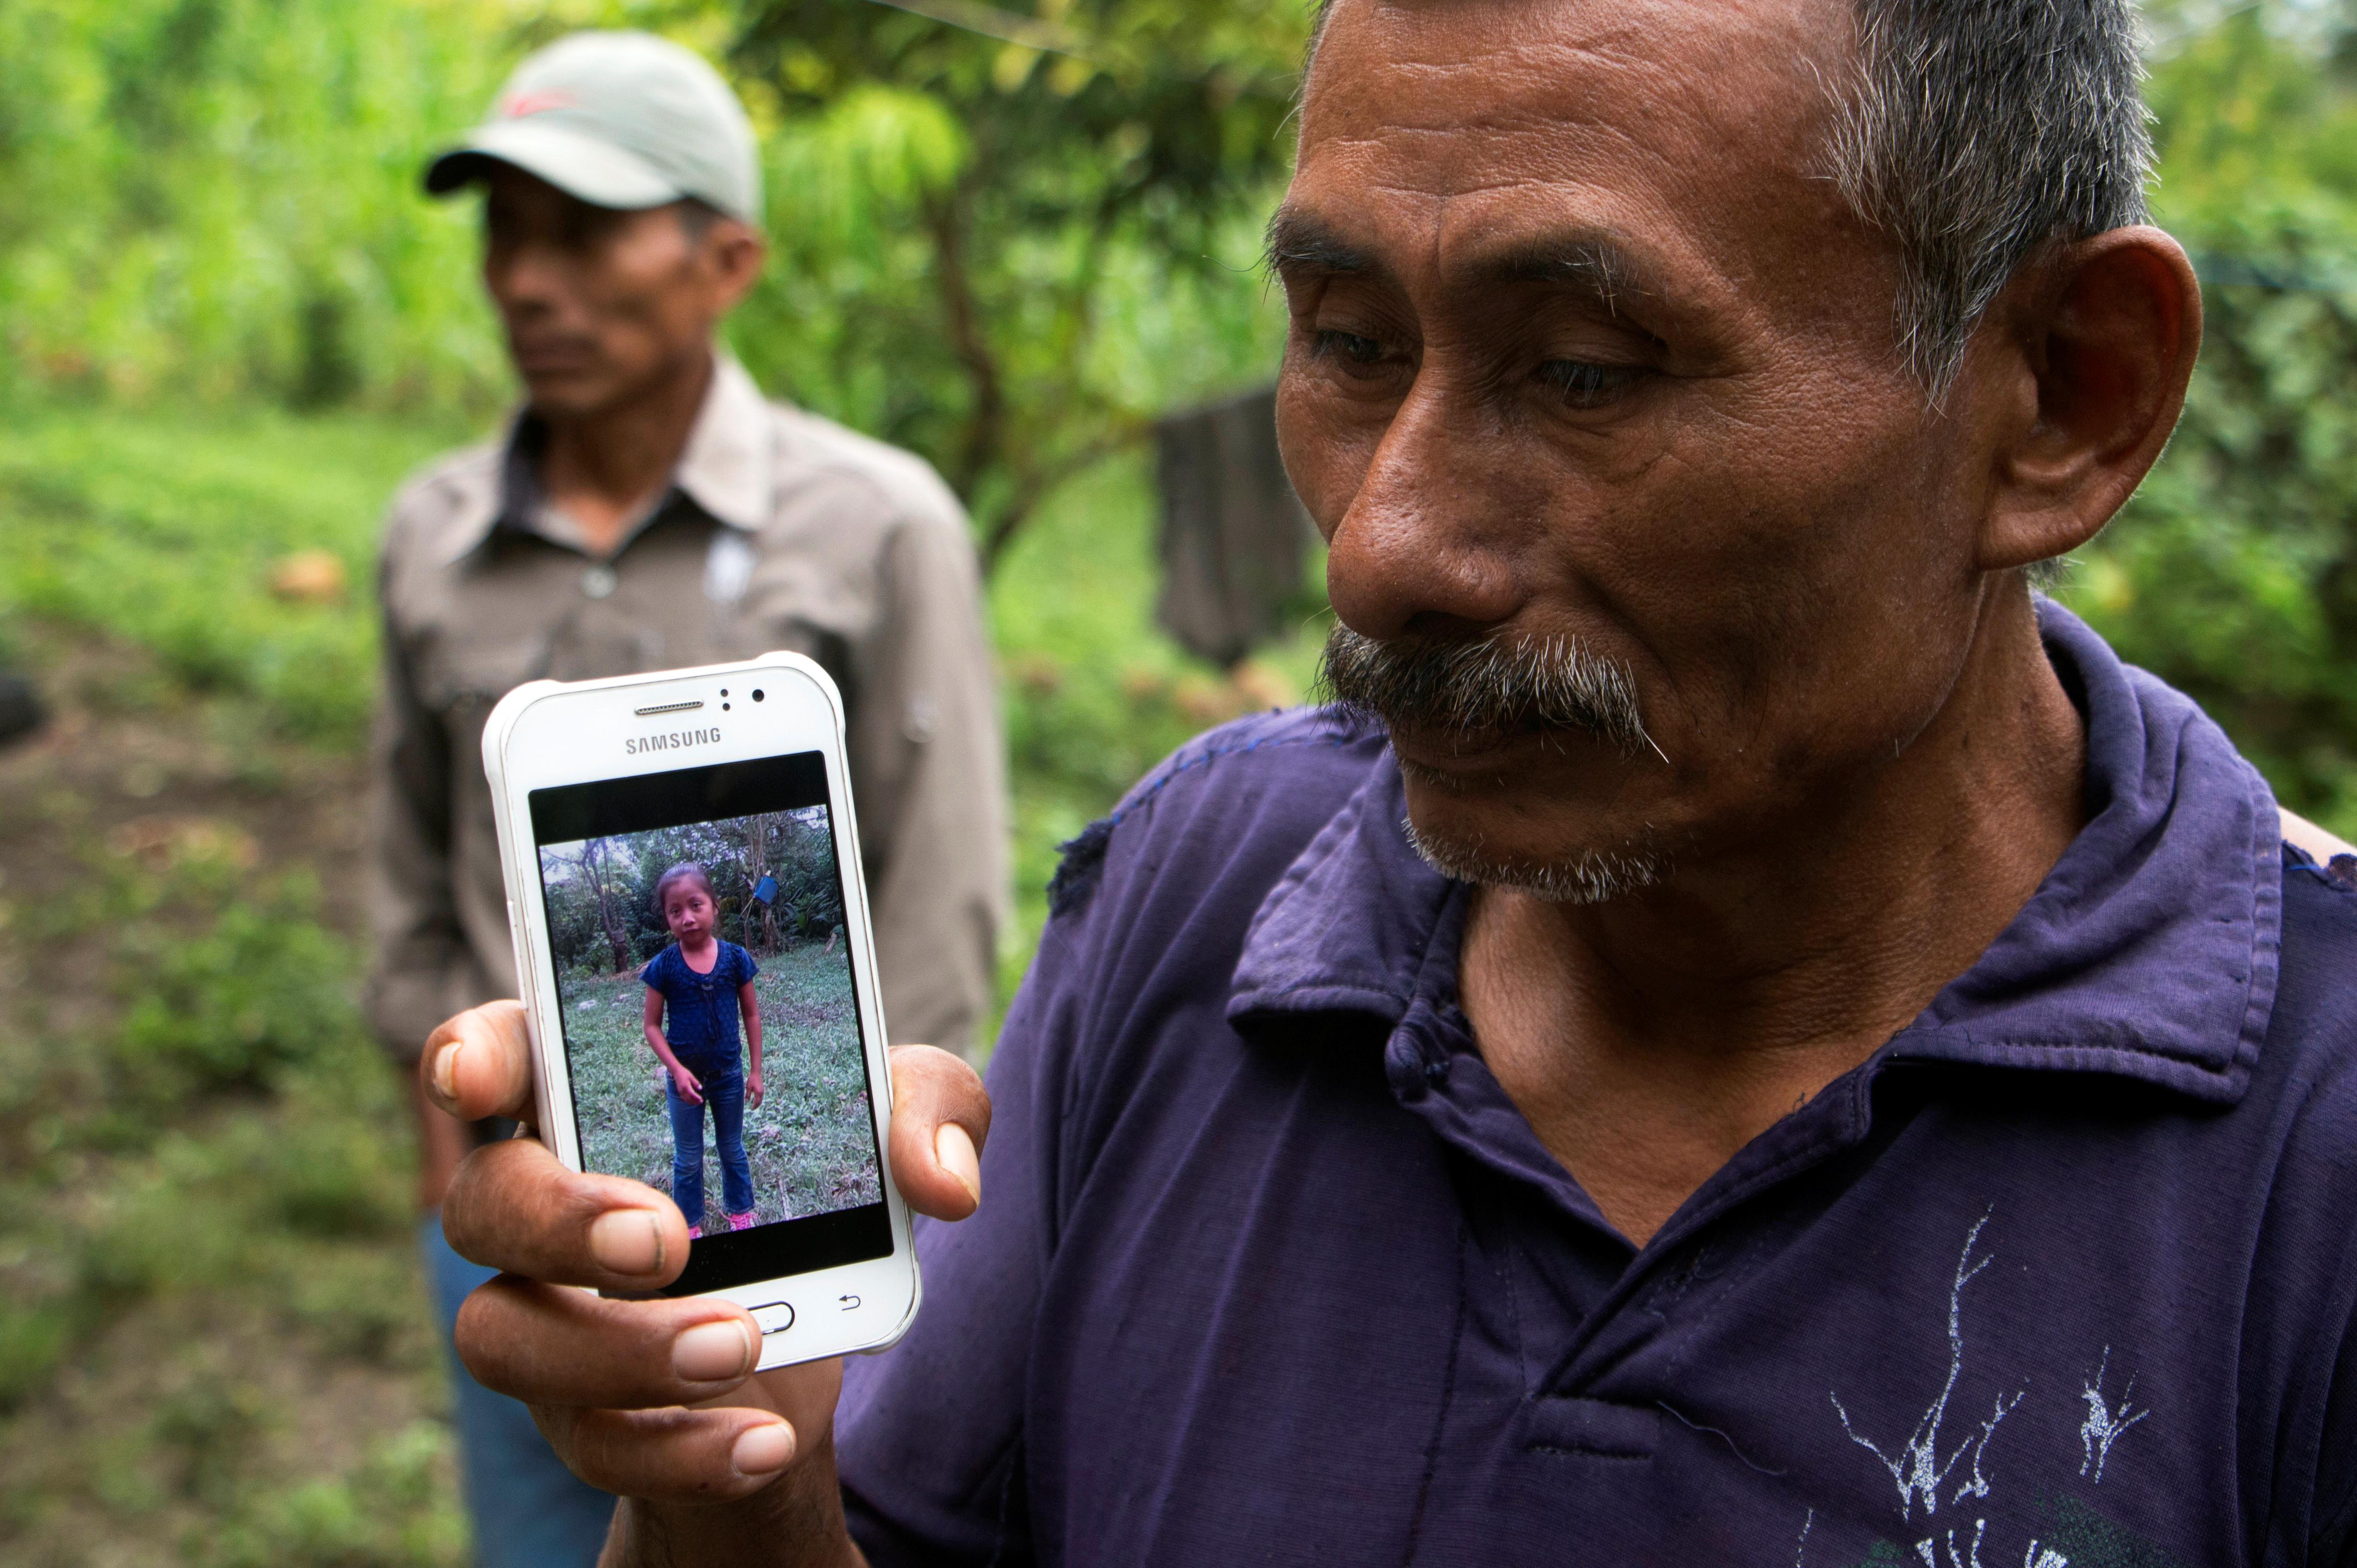 Dead Guatemalan girl dreamed of sending money home to poor